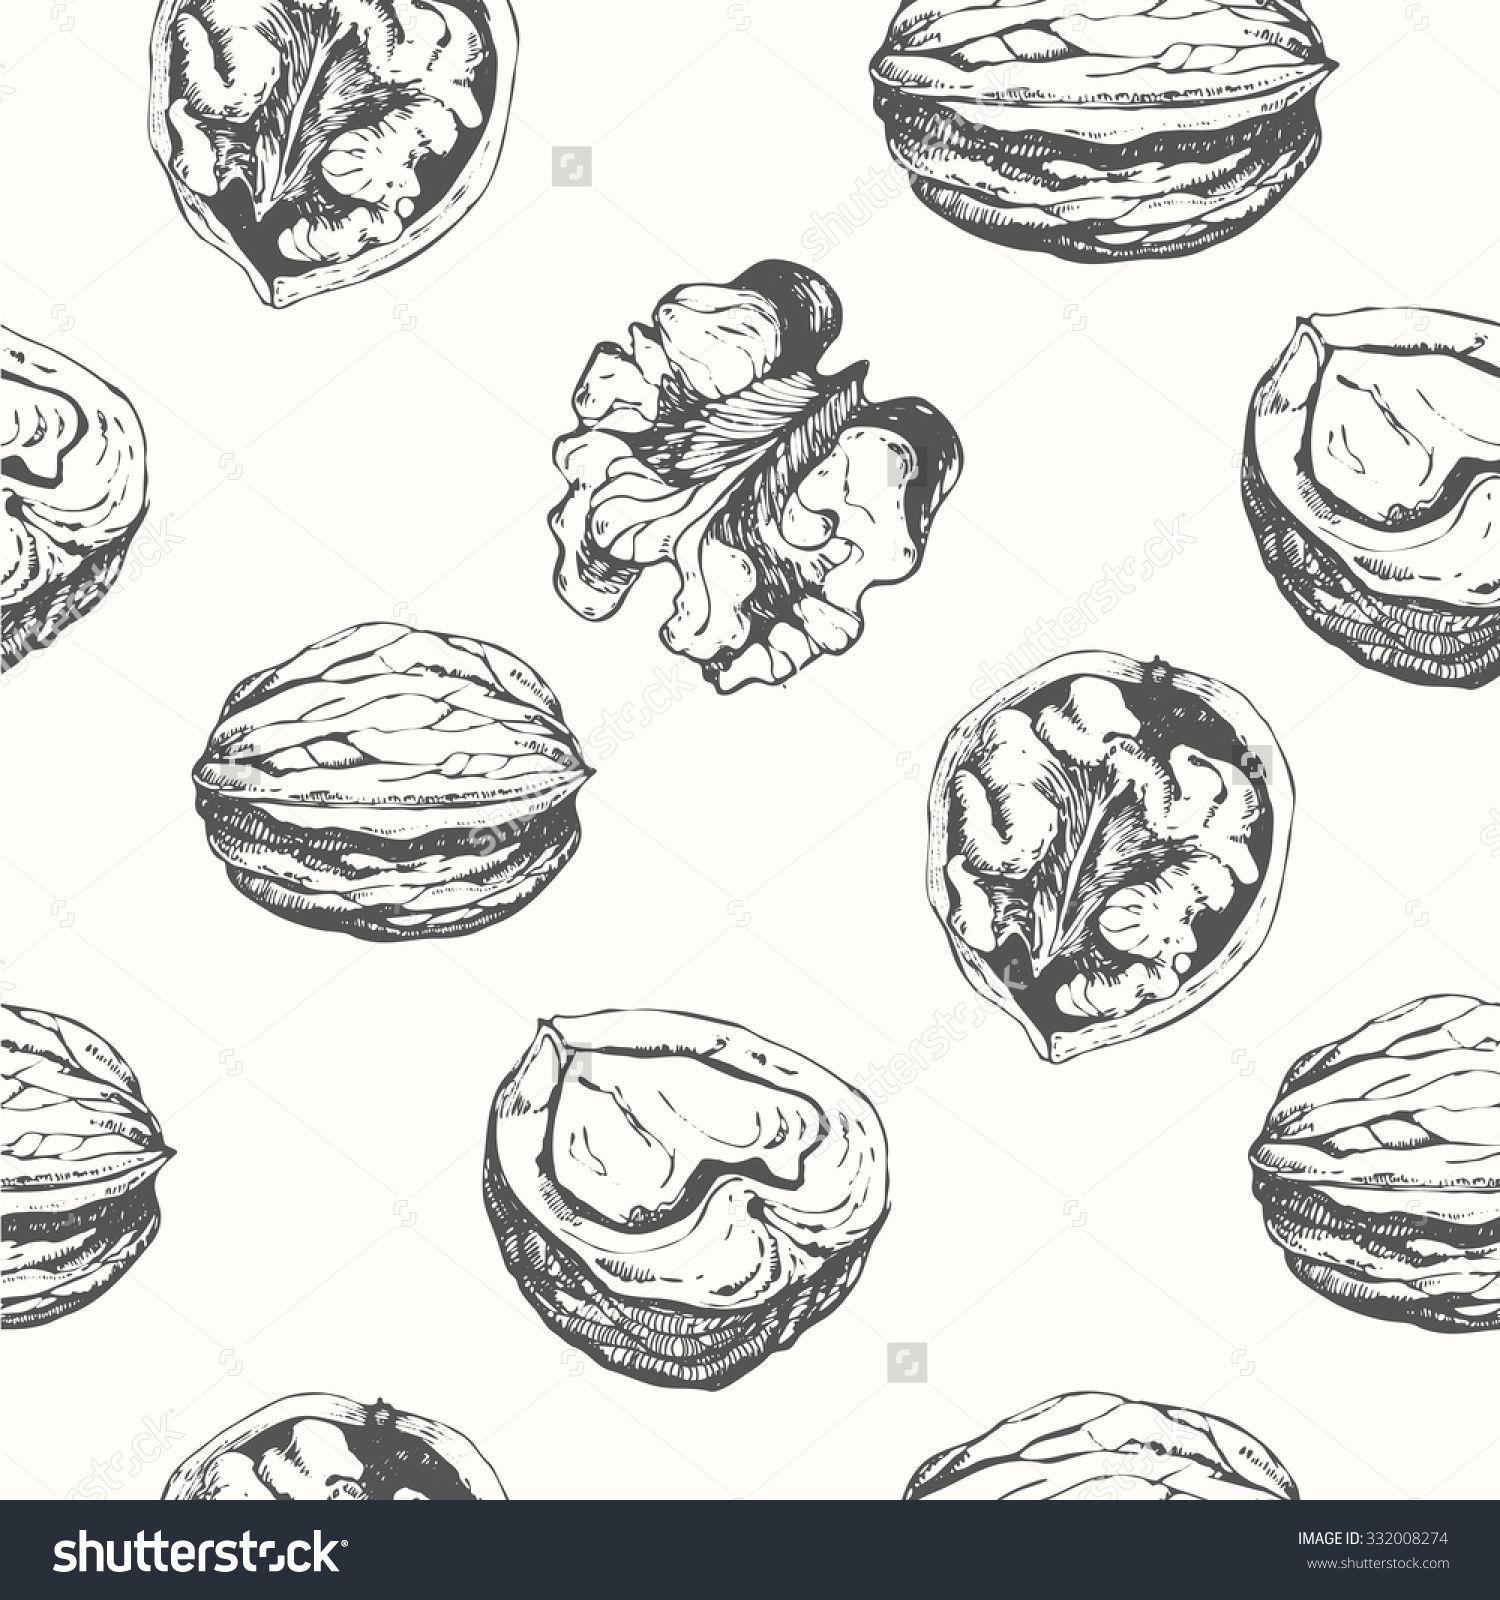 Hand Drawn Sketch Of Walnuts Seamless Nature Background Fresh